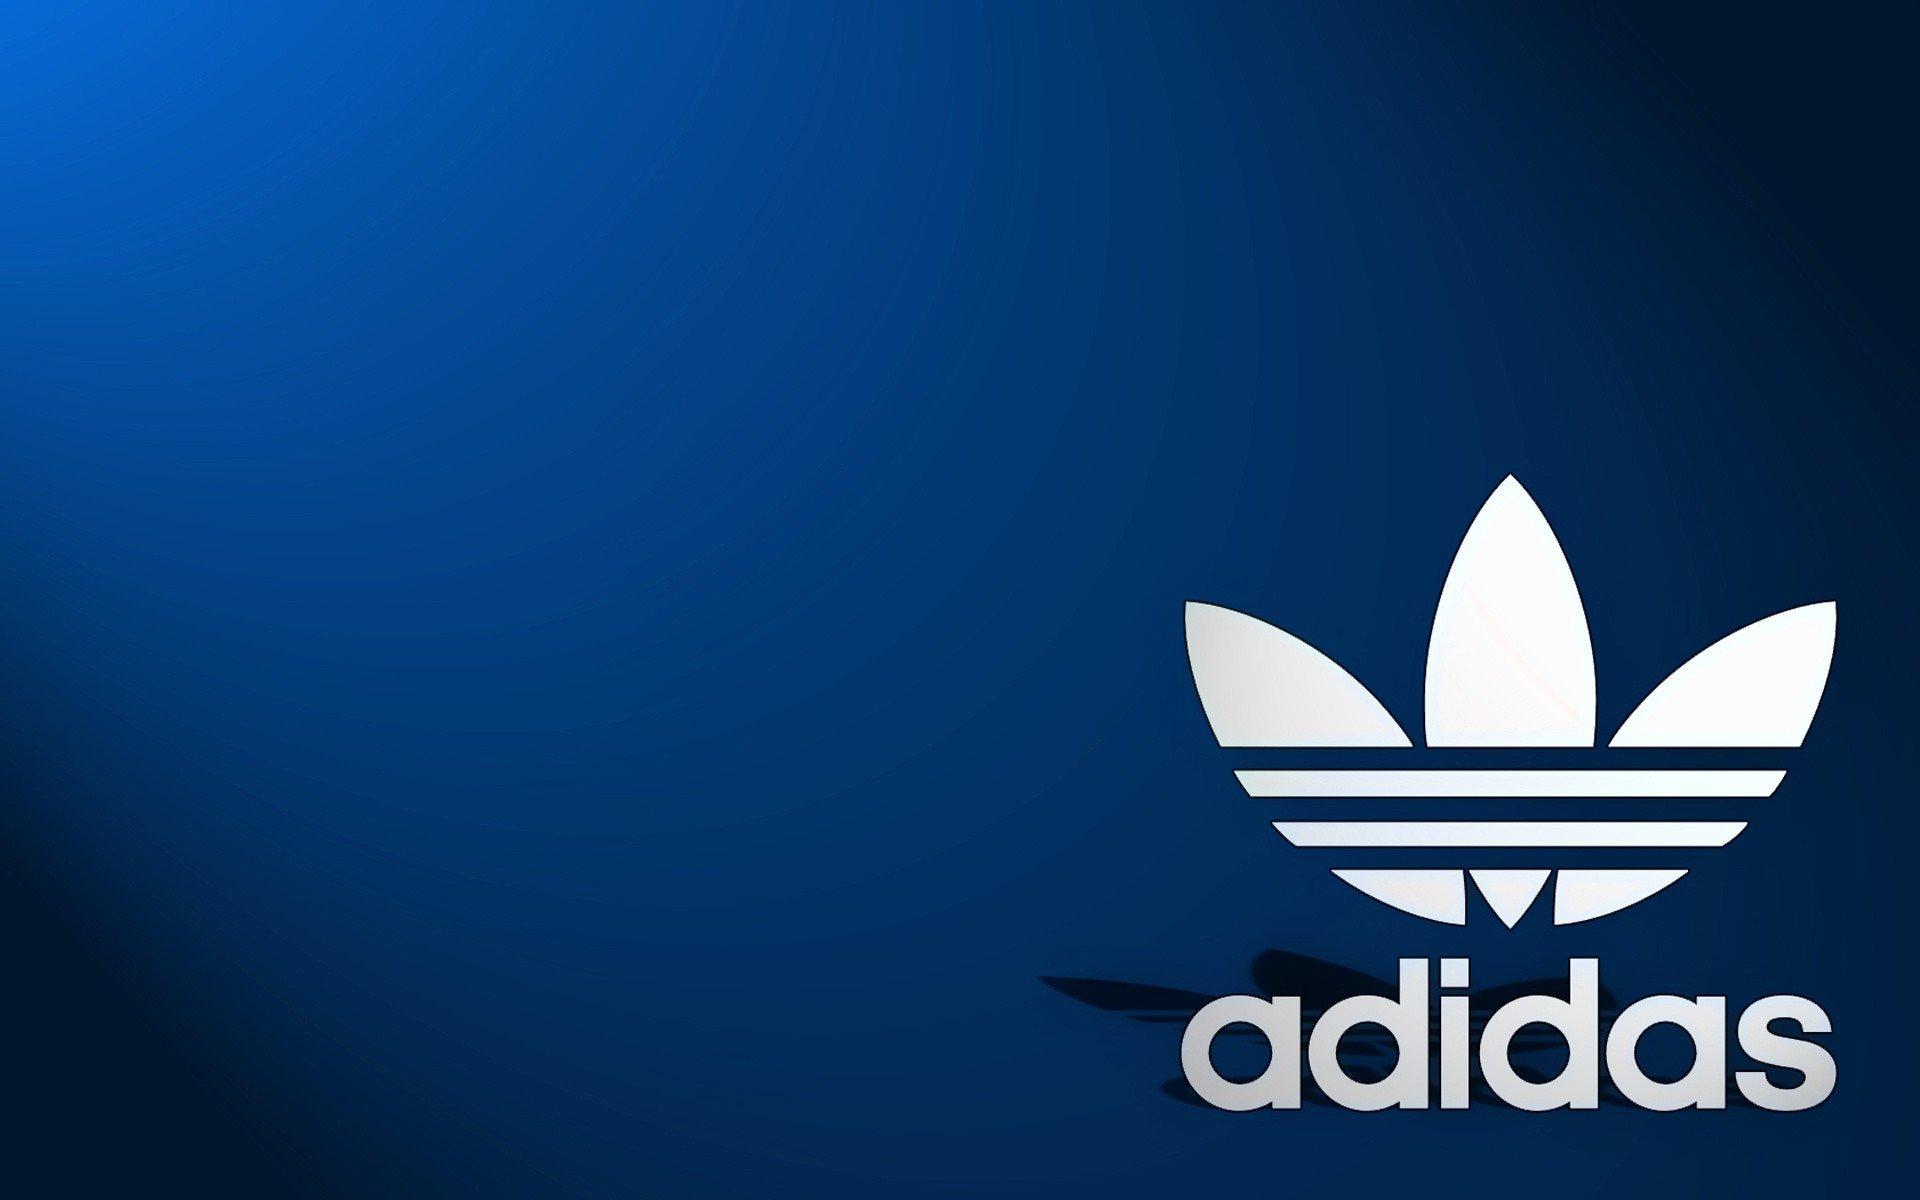 Avispón Recuento Predecesor  Fondos de pantalla : 1920x1200 px, Adidas, fondo, azul, Marcas, Logotipos, vieja  escuela, Deportes 1920x1200 - wallbase - 1573577 - Fondos de pantalla -  WallHere